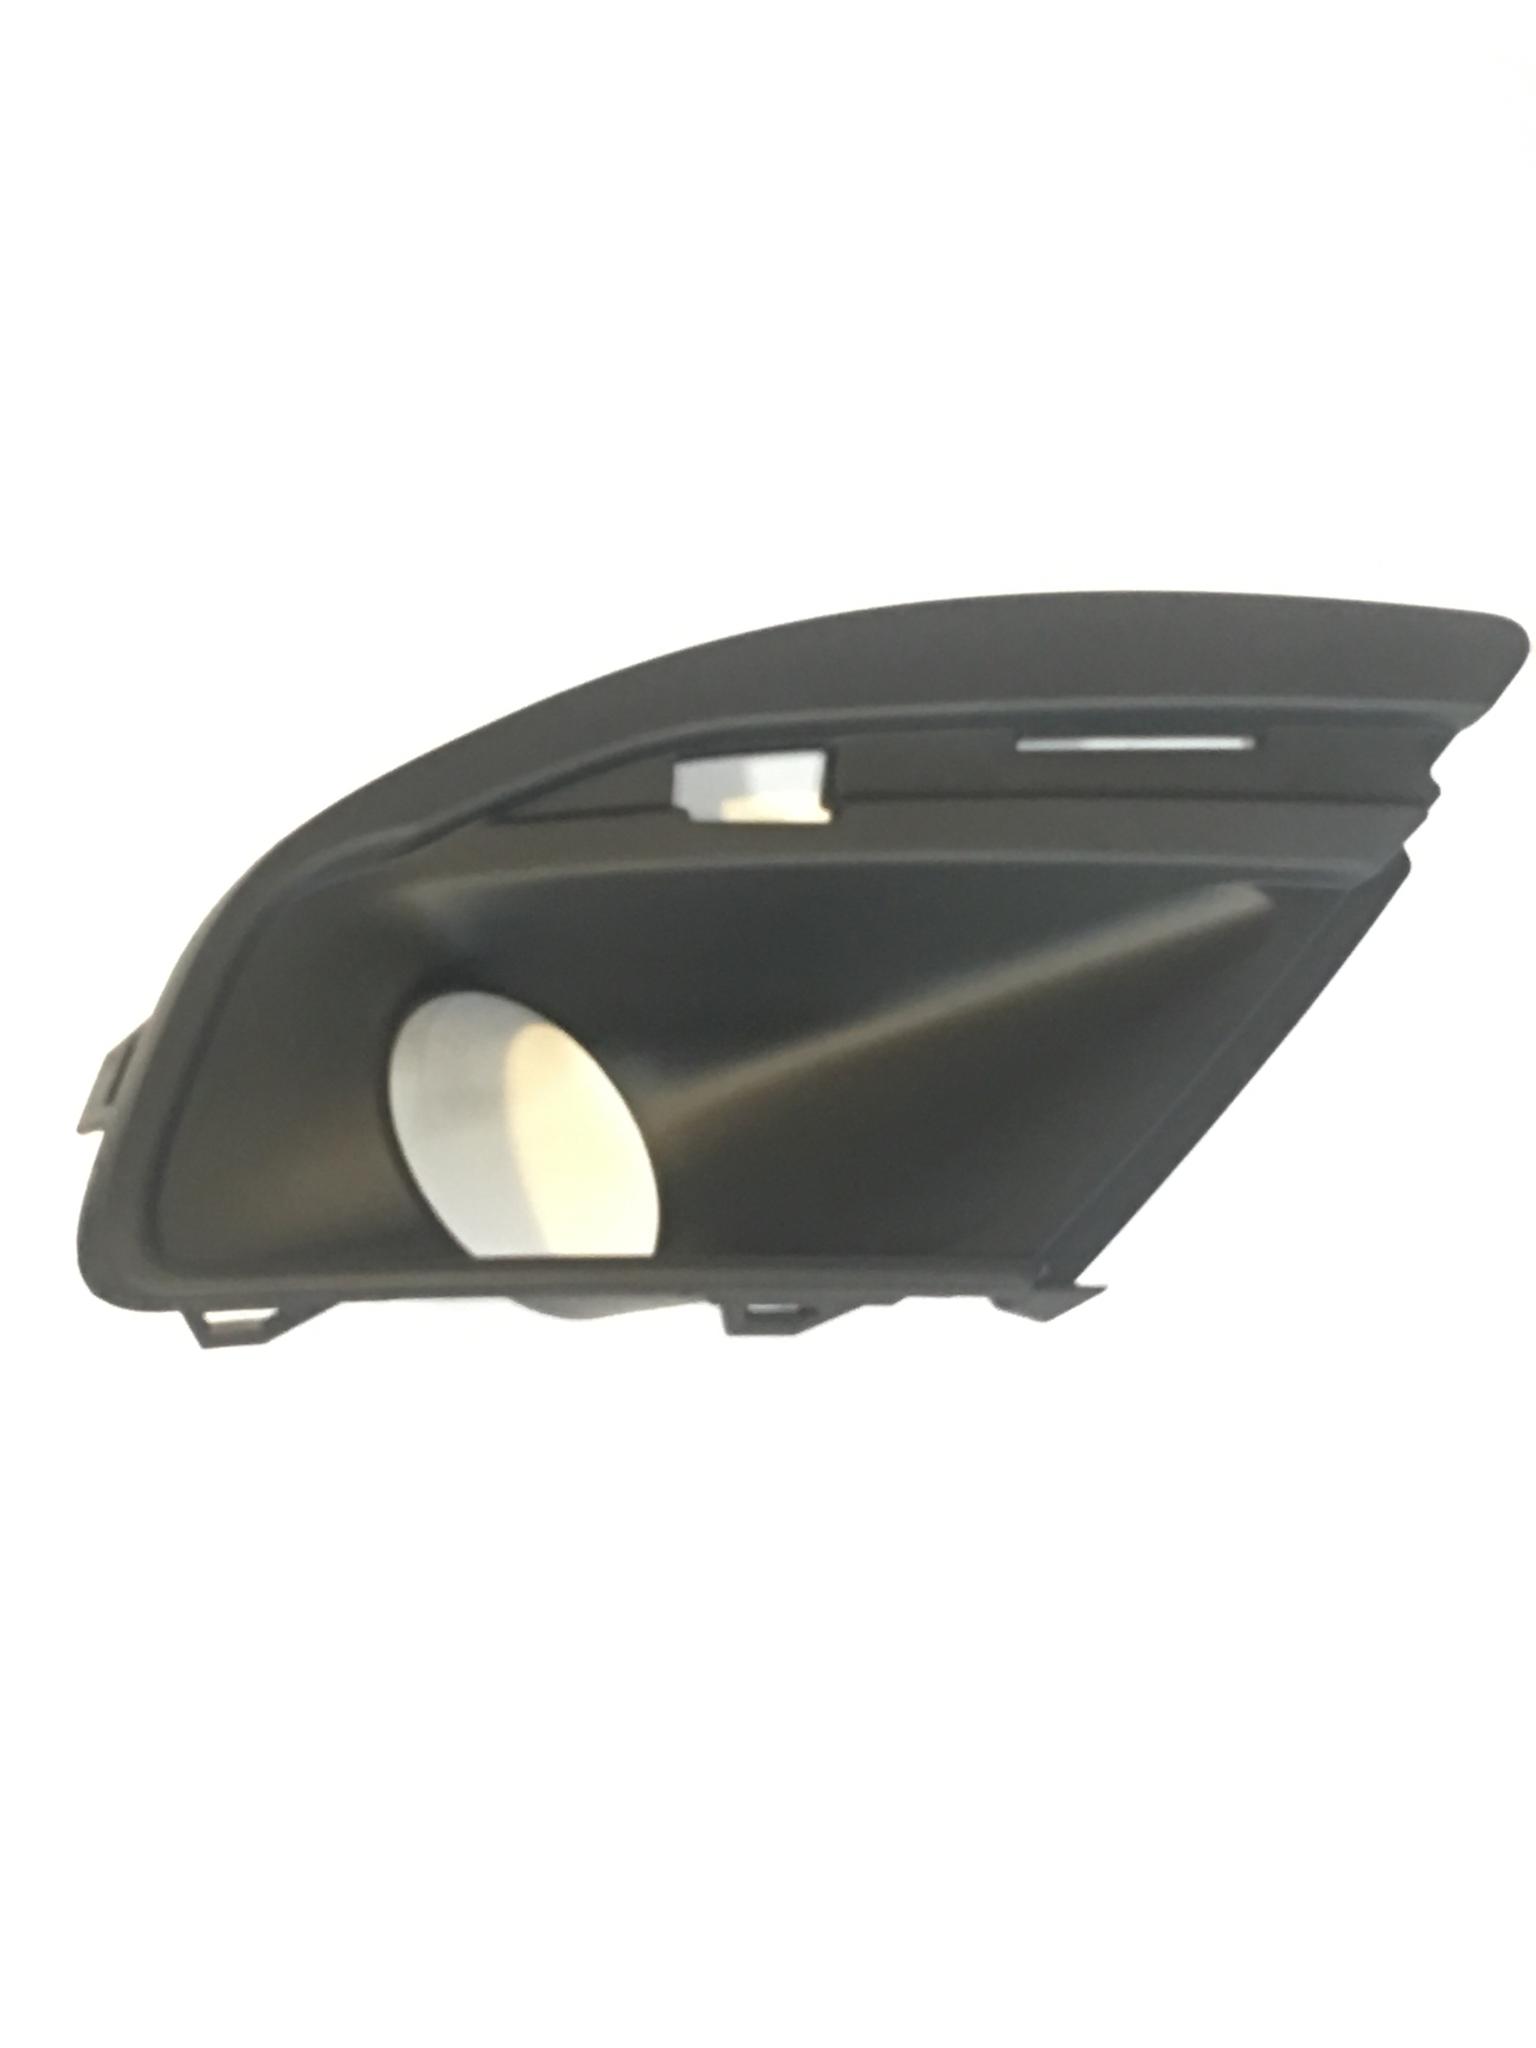 Облицовки противотуманных фар для Lada Granta FL (2018)